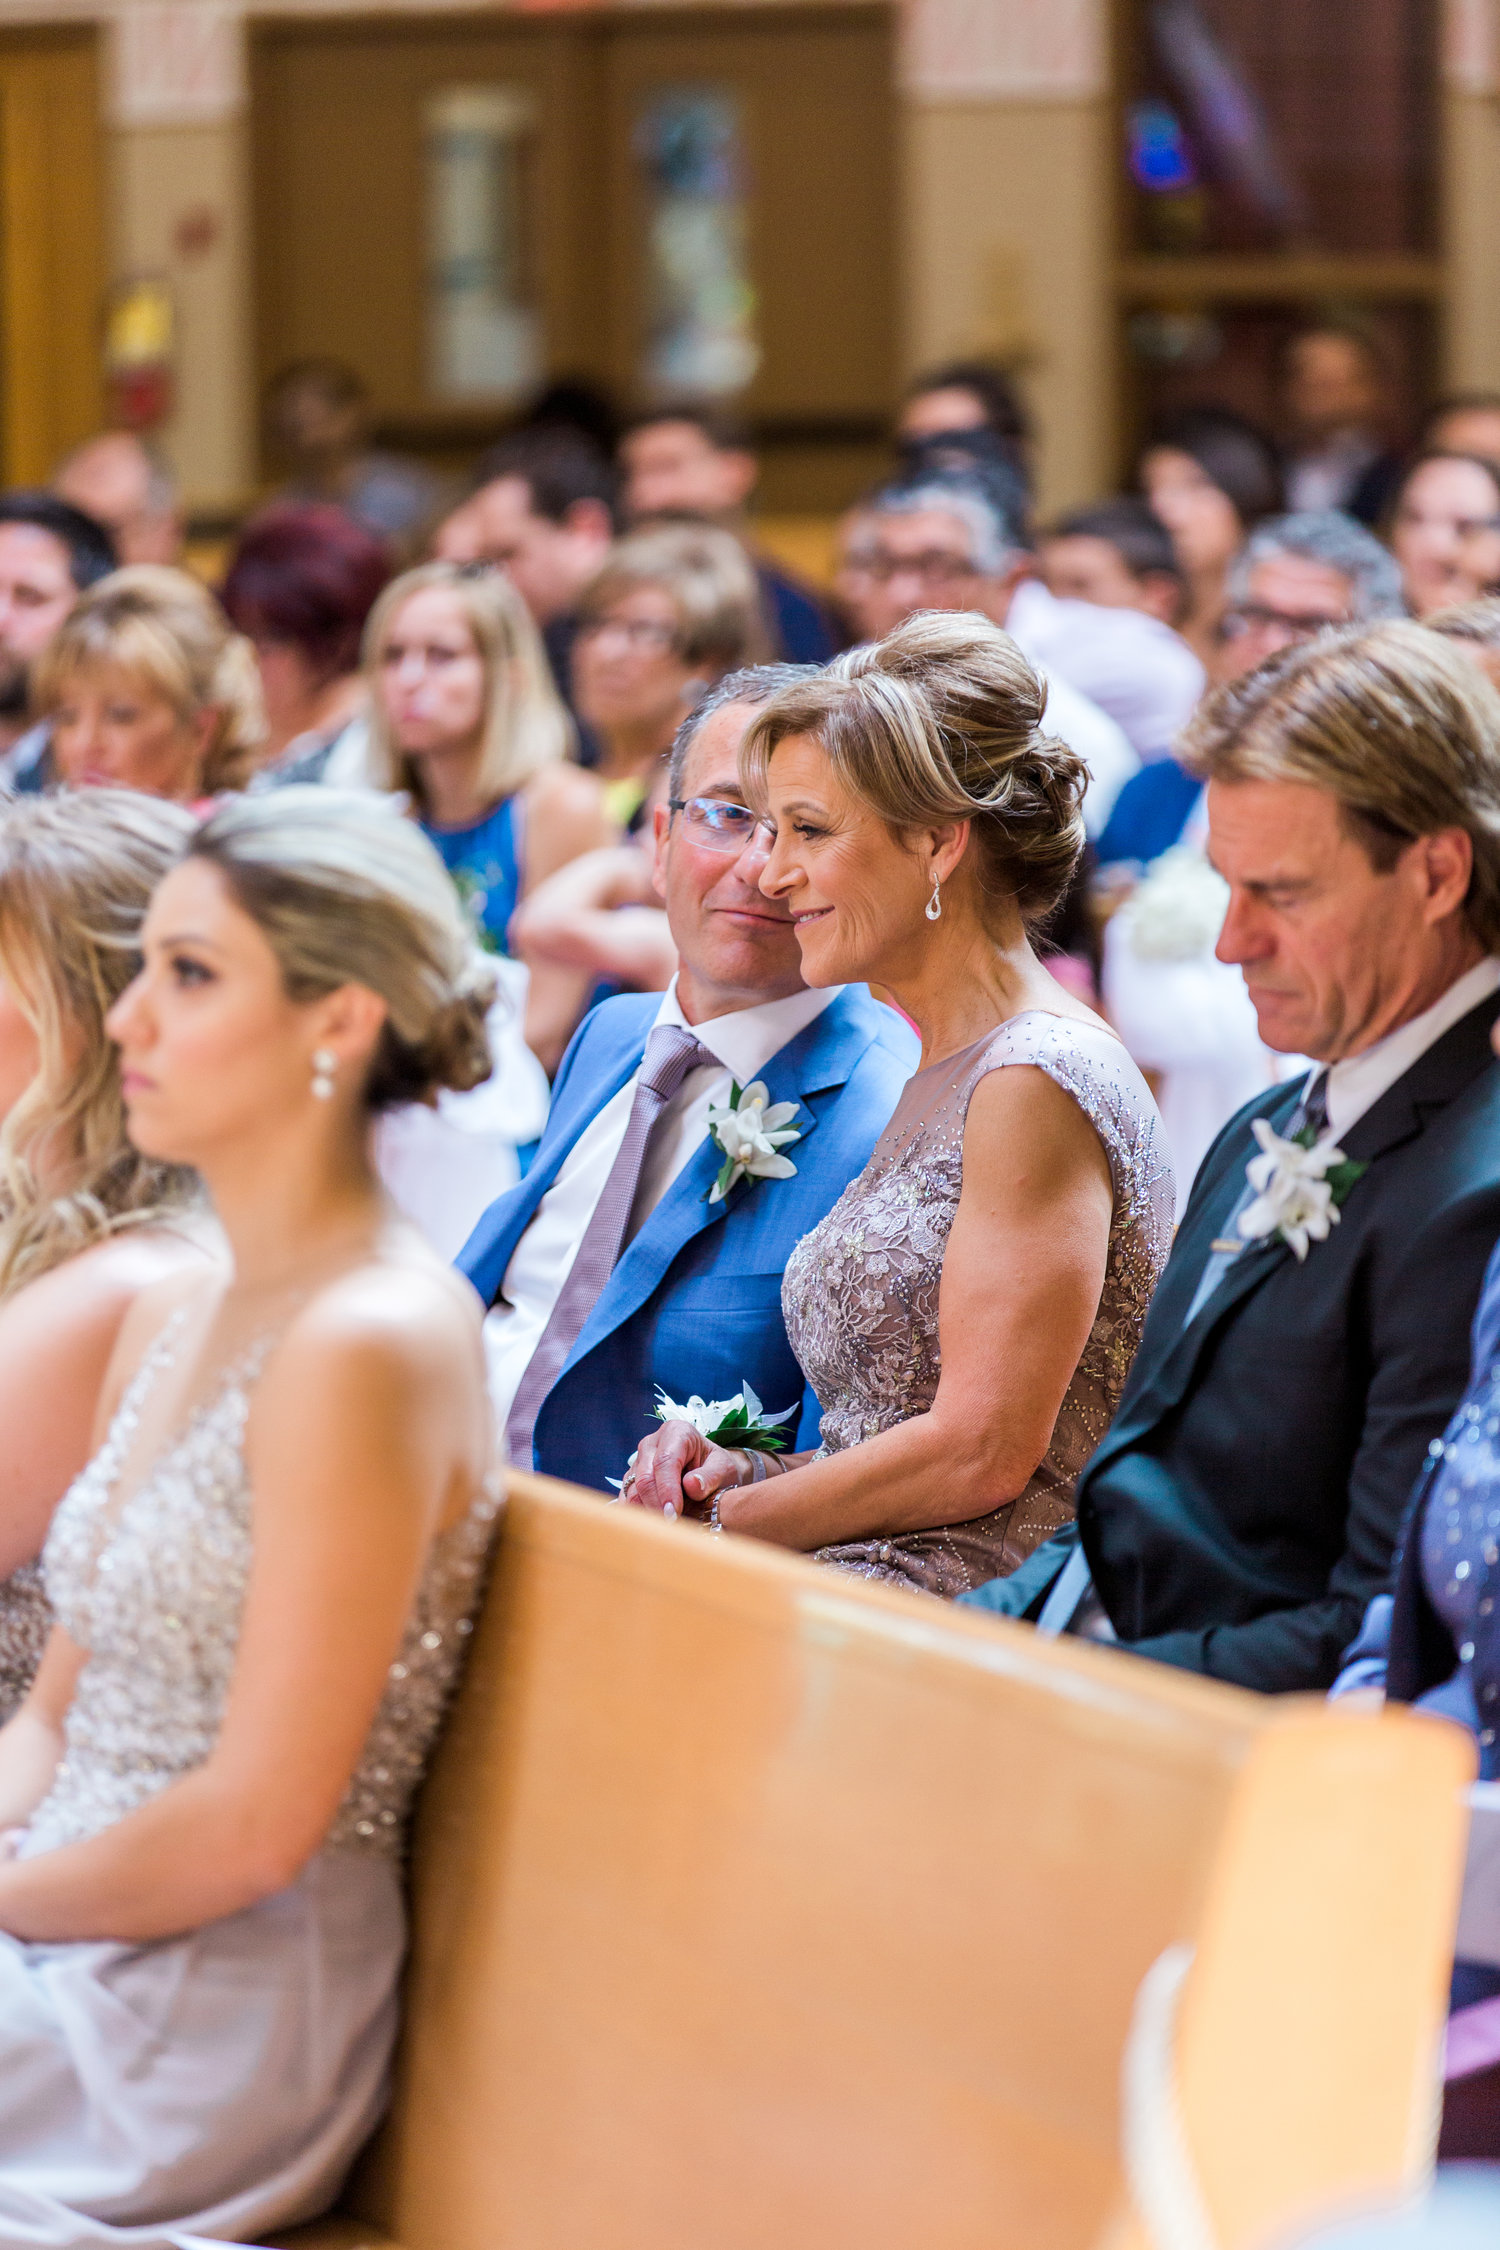 Danielle-Giroux-Amir-Golbazi-Toronto-Wedding-Photographer-Bellvue-Manor_DeLuca_1-383.jpg